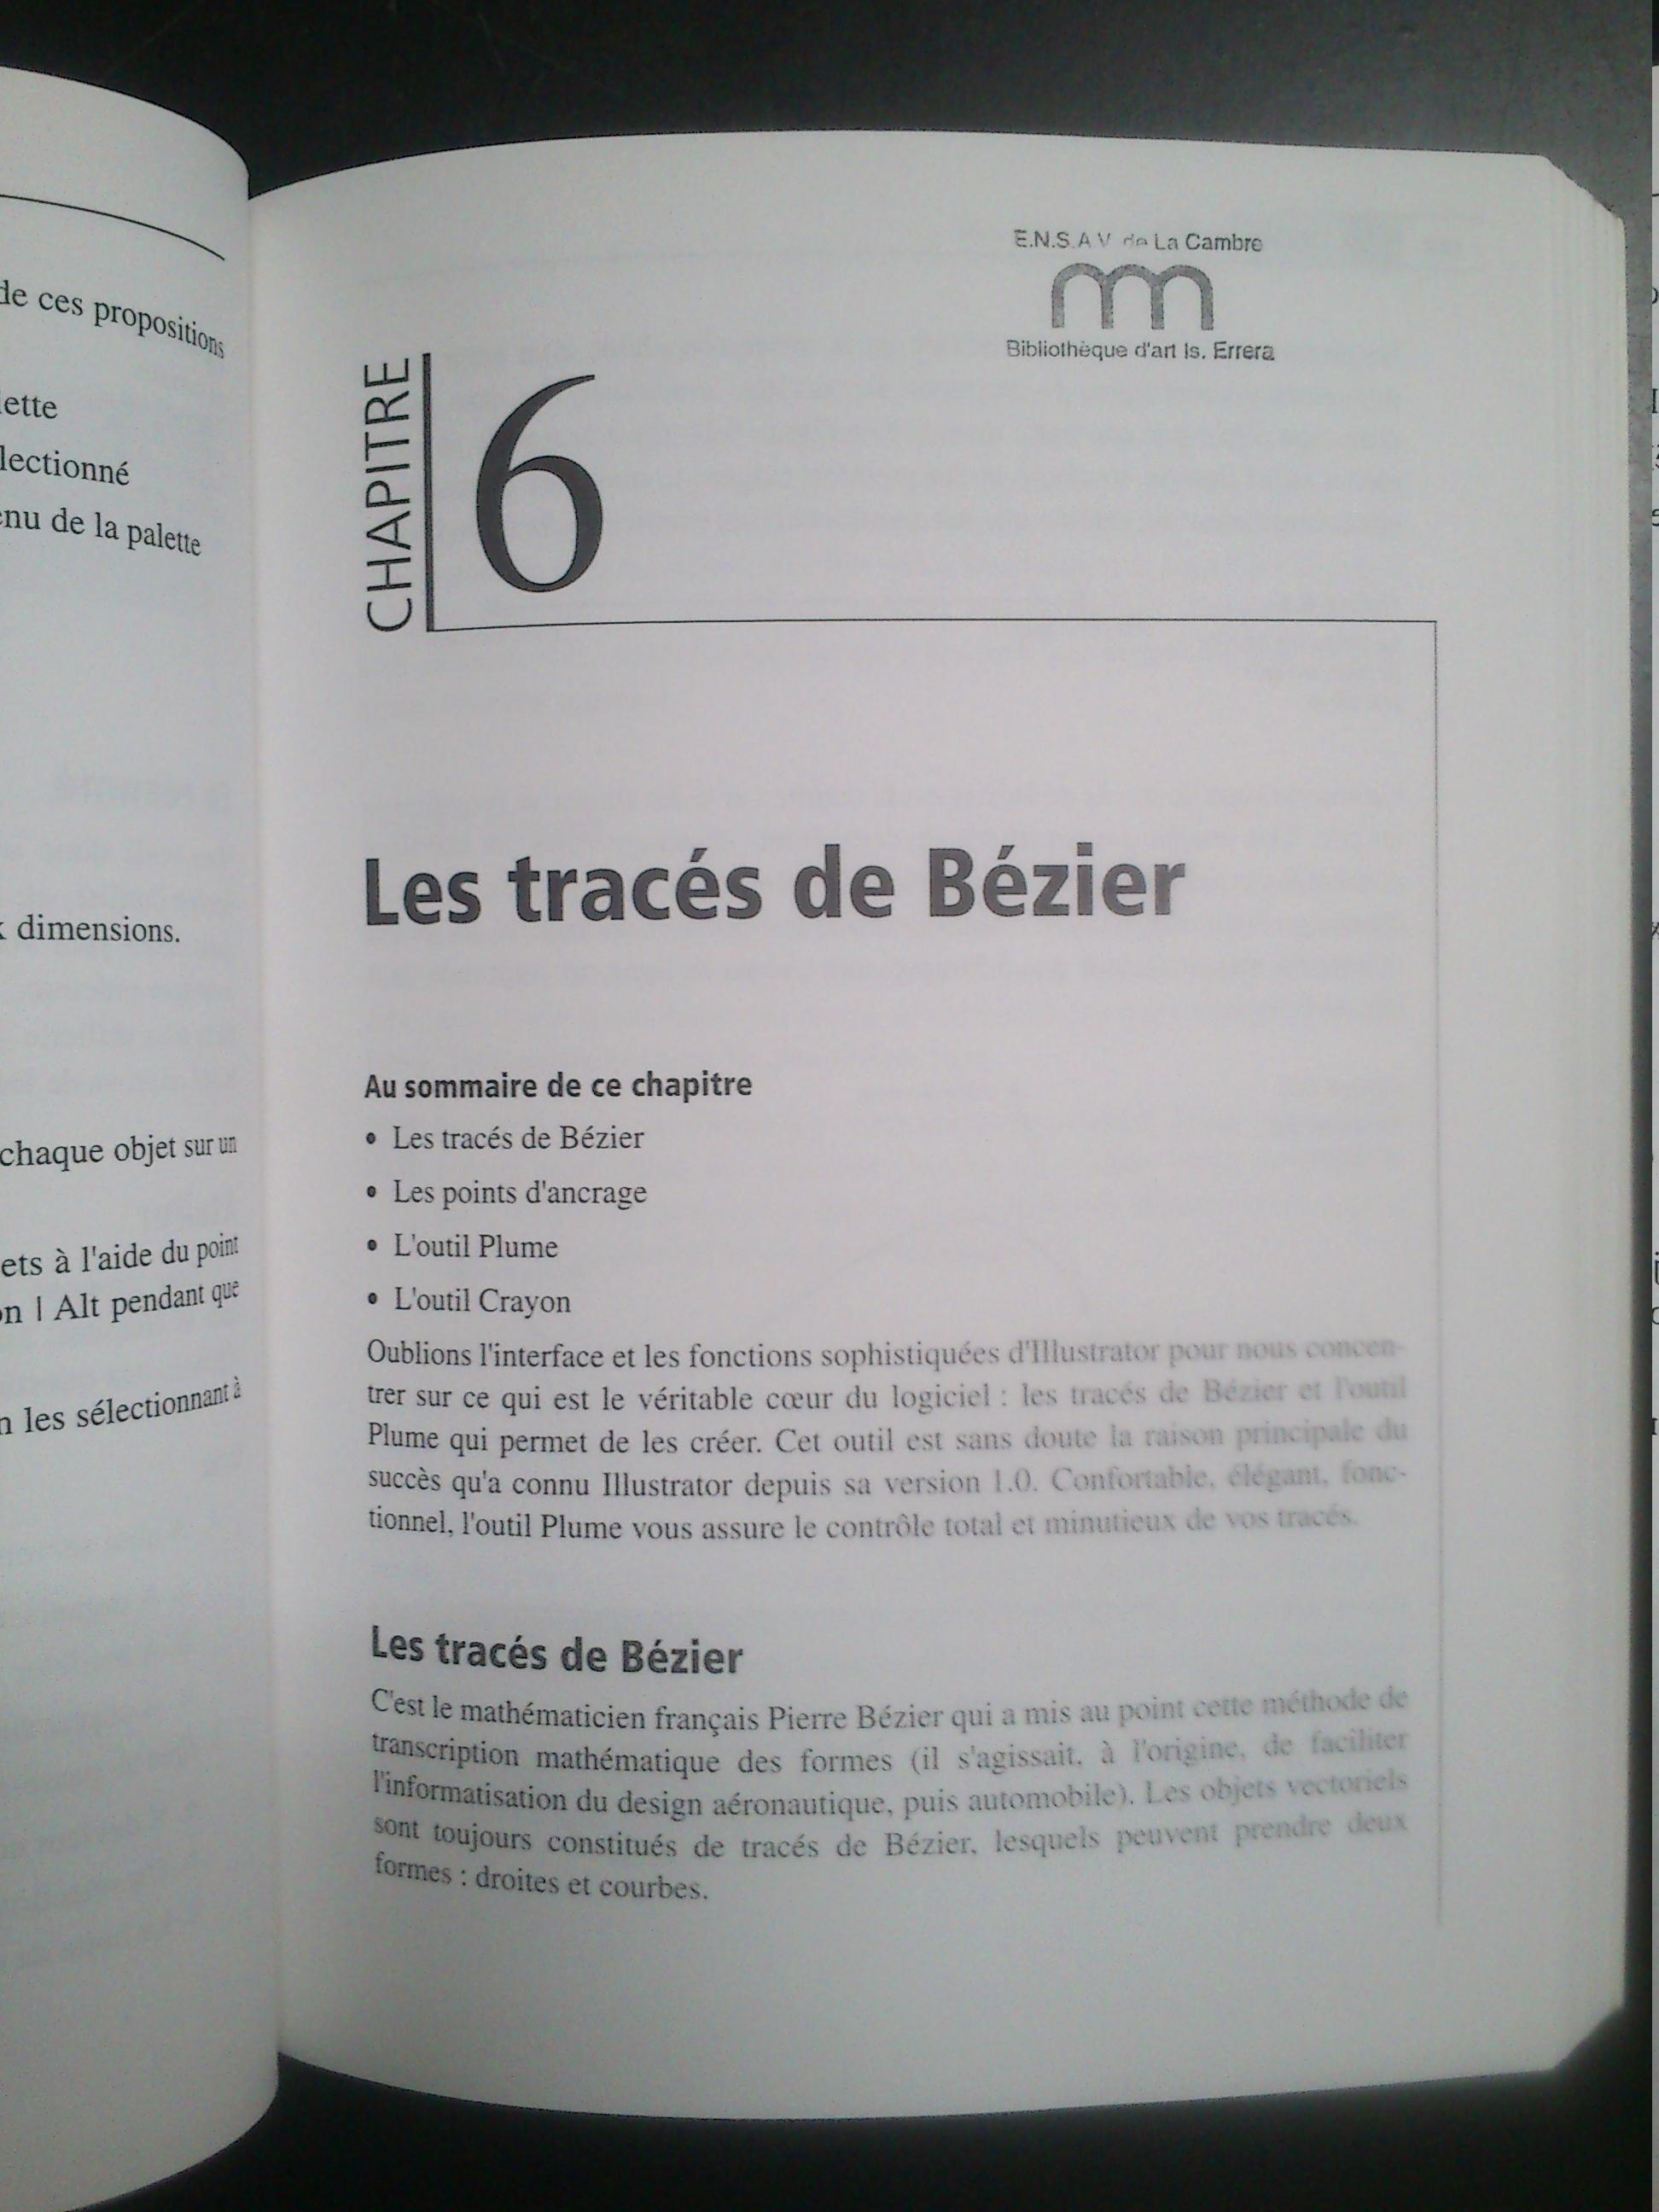 other/photos bibliothèque cambre/DSC_0433.jpg